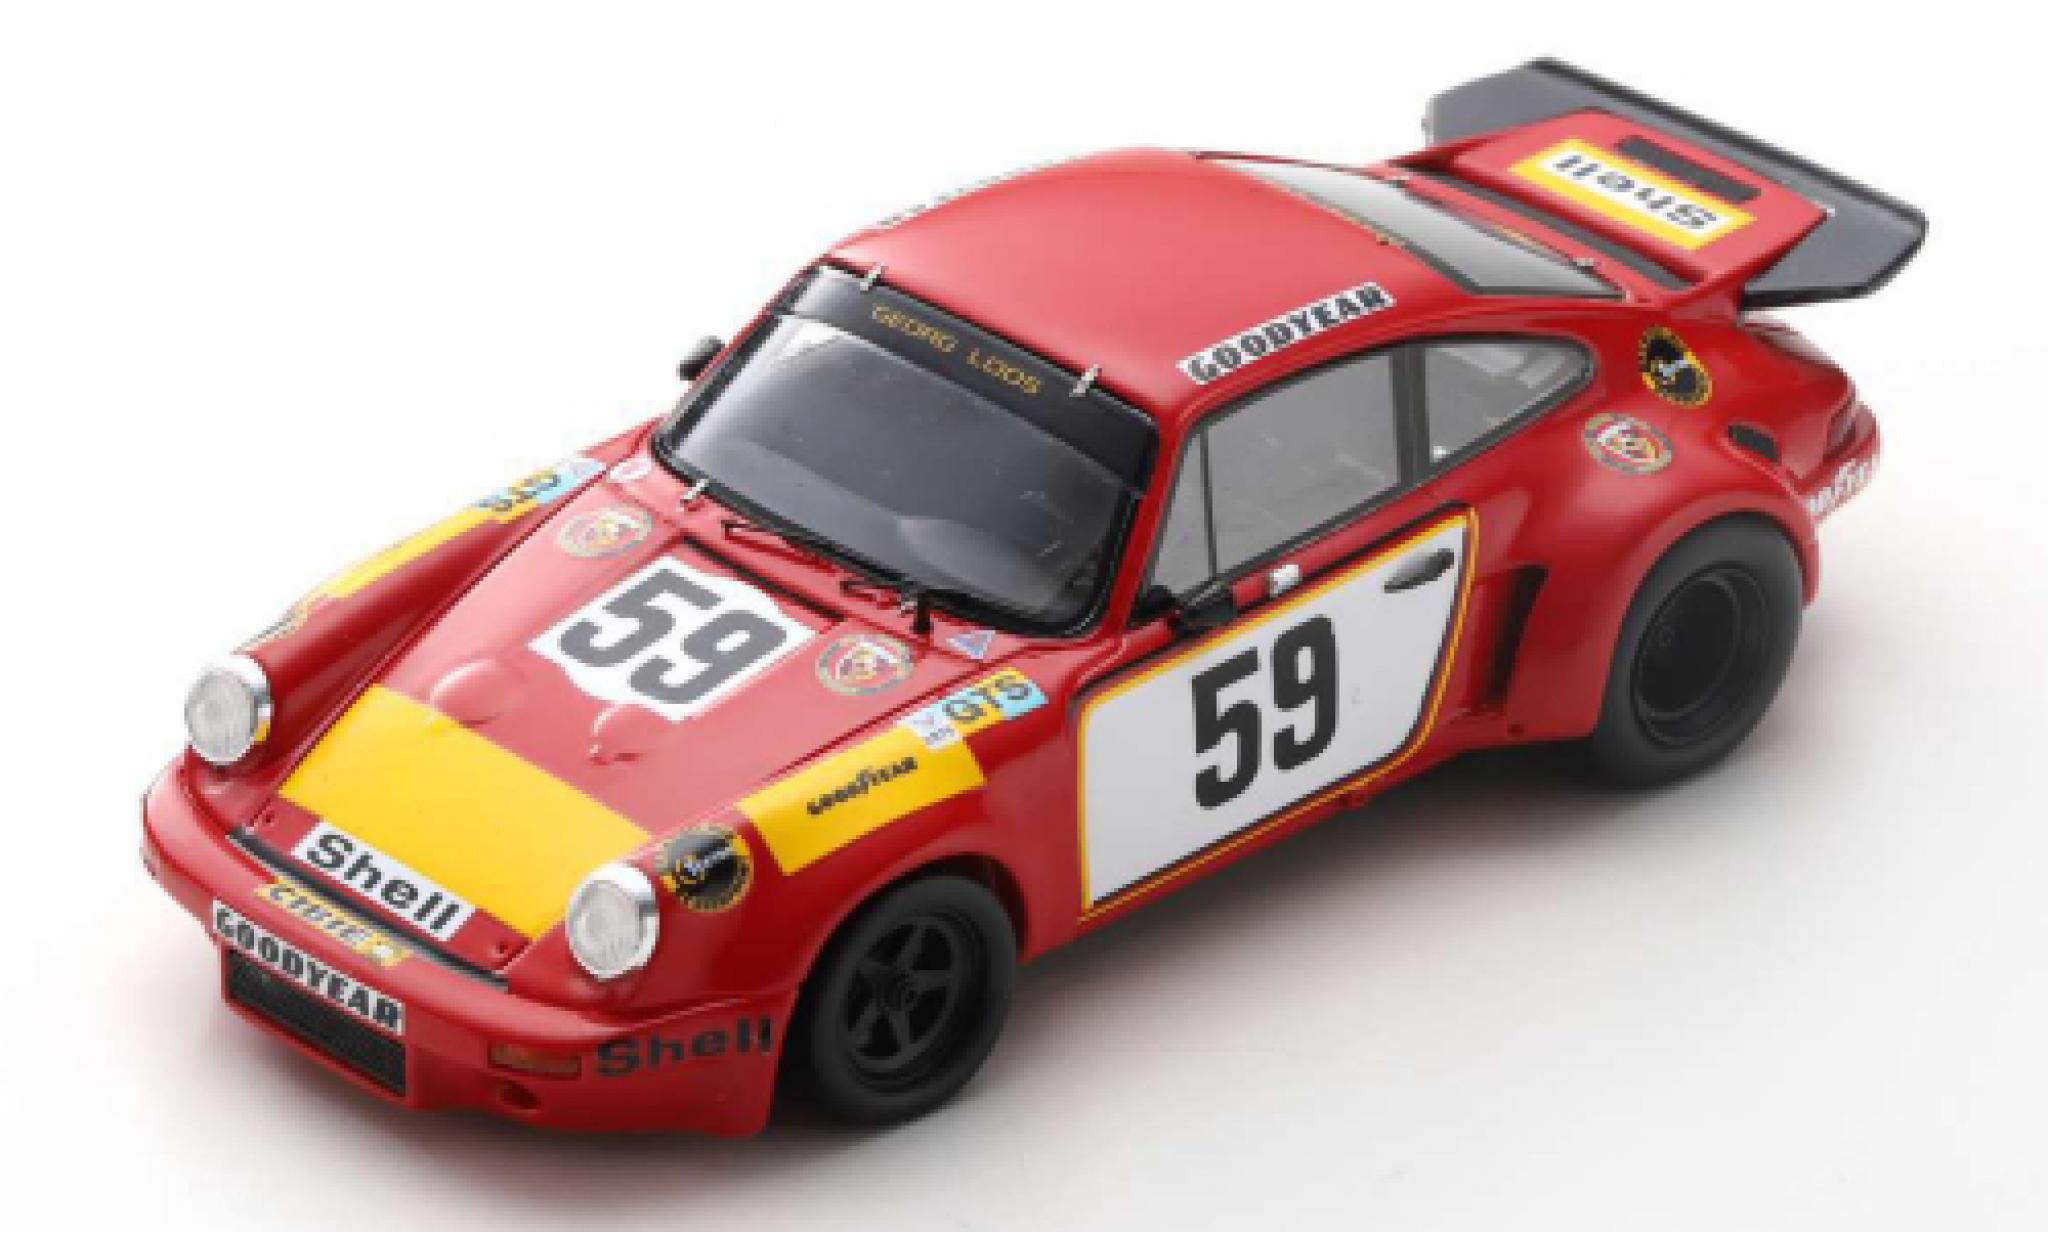 Porsche 930 RSR 1/43 Spark 911 Carrera No.59 Gelo Racing Team 24h Le Mans 1975 T.Schenken/H.Ganley